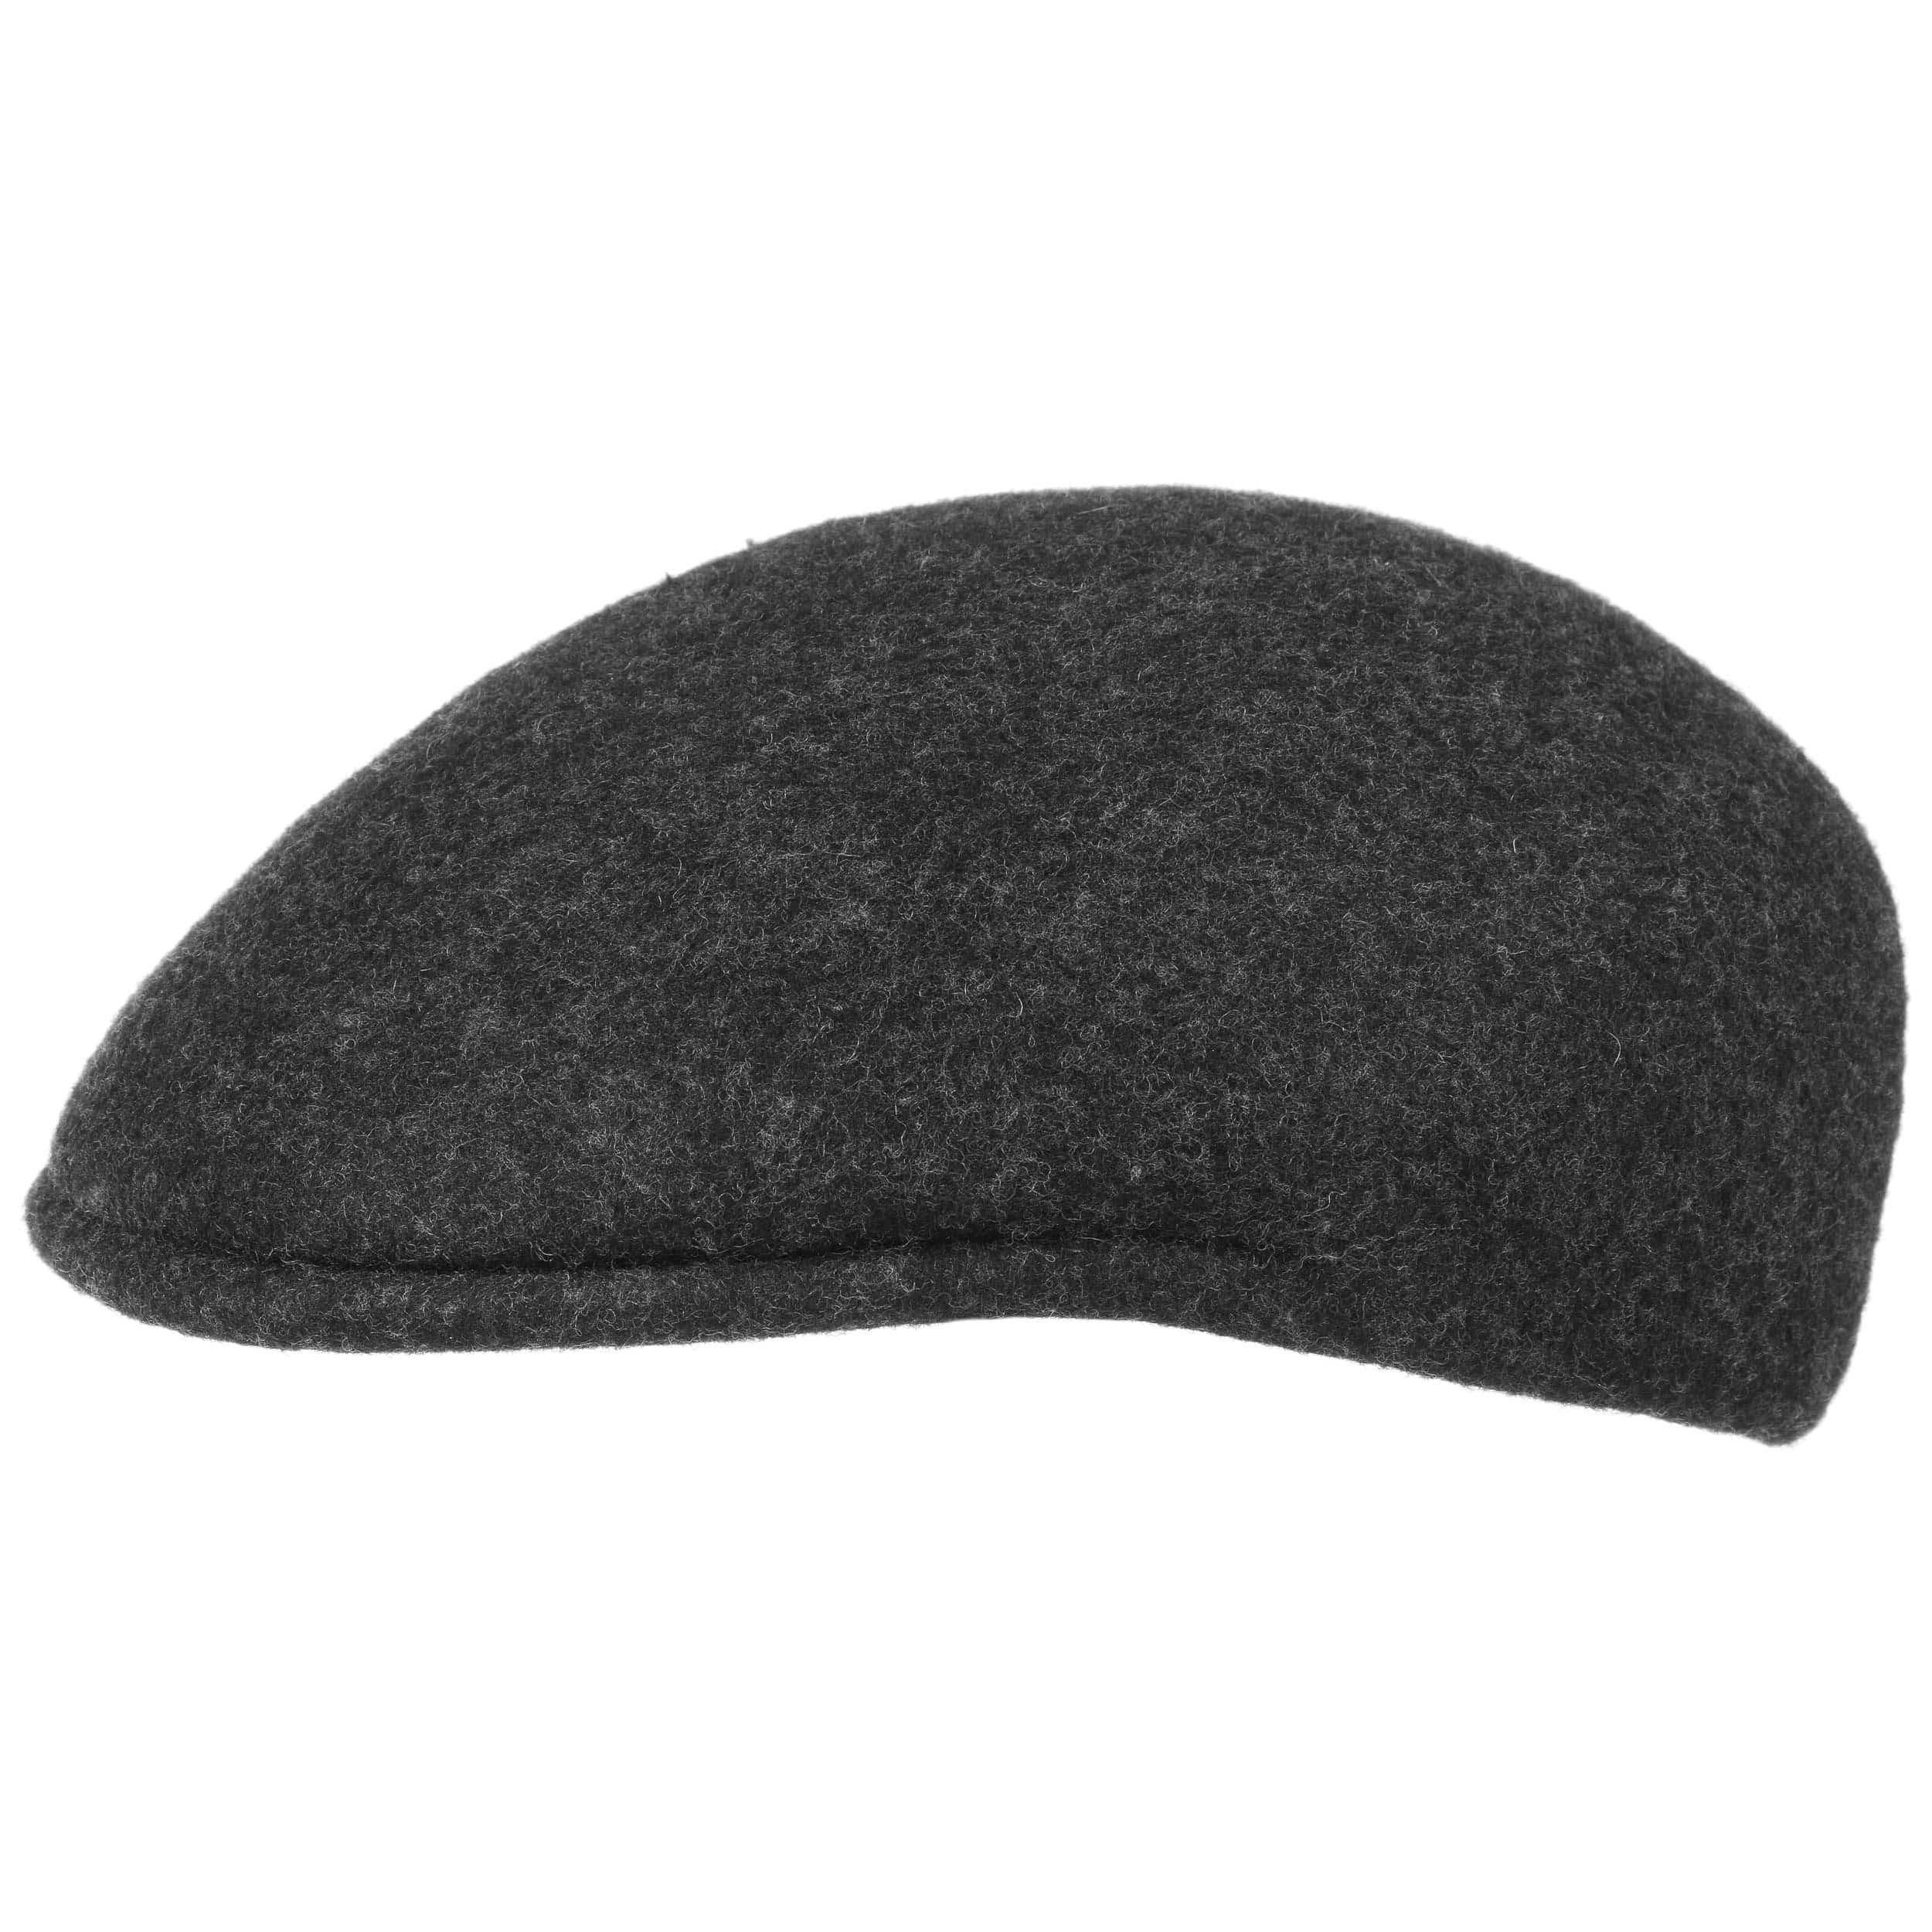 ... Youngsten Wool Felt Flat Cap - anthracite 4 ... d65c294fc4c